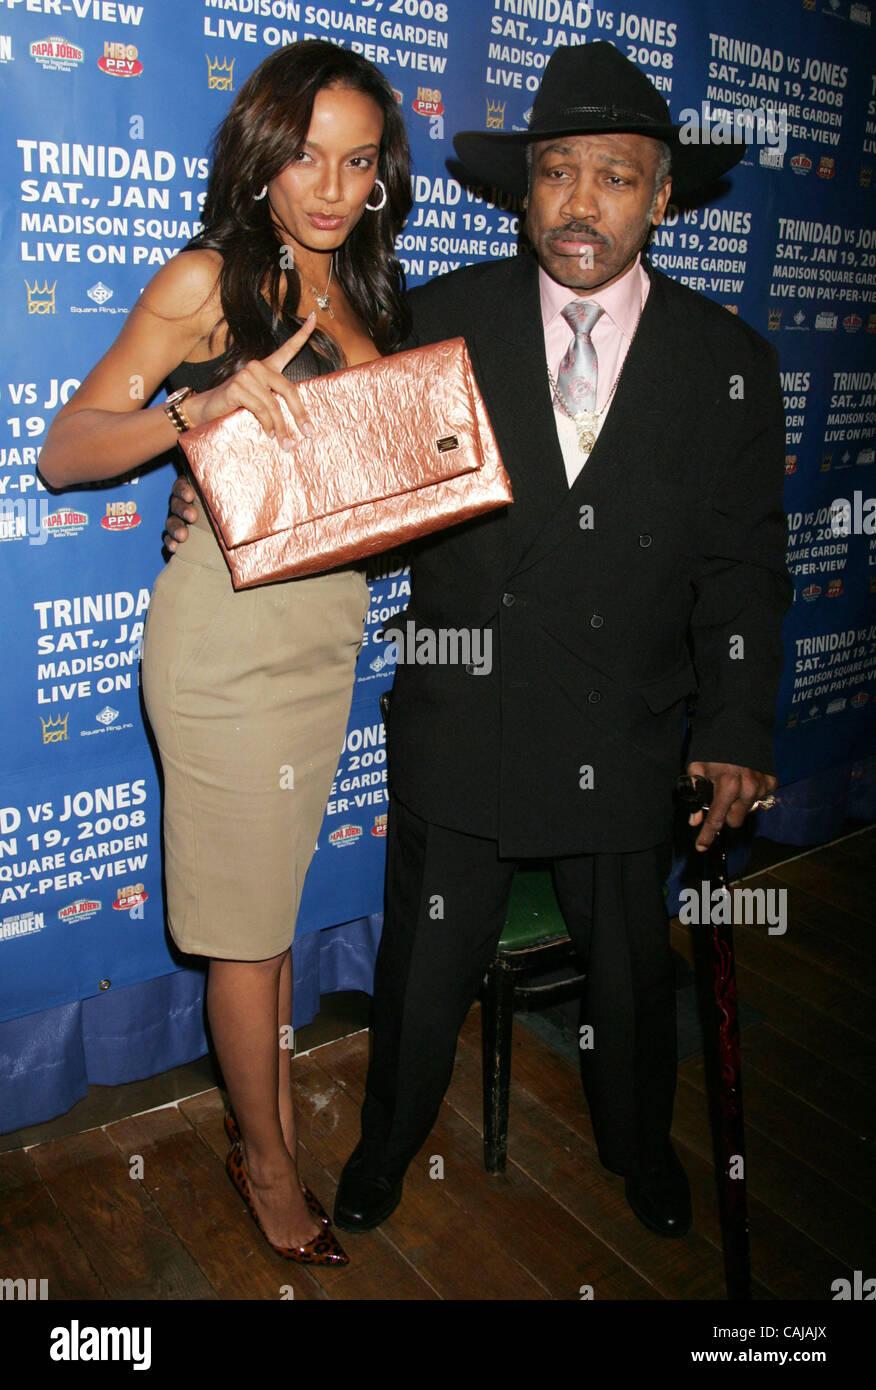 Jan 14, 2008 - New York, NY, USA - Actress/ Victoria's Secret Model SELITA EBANKS and boxing legend JOE FRAZIER - Stock Image